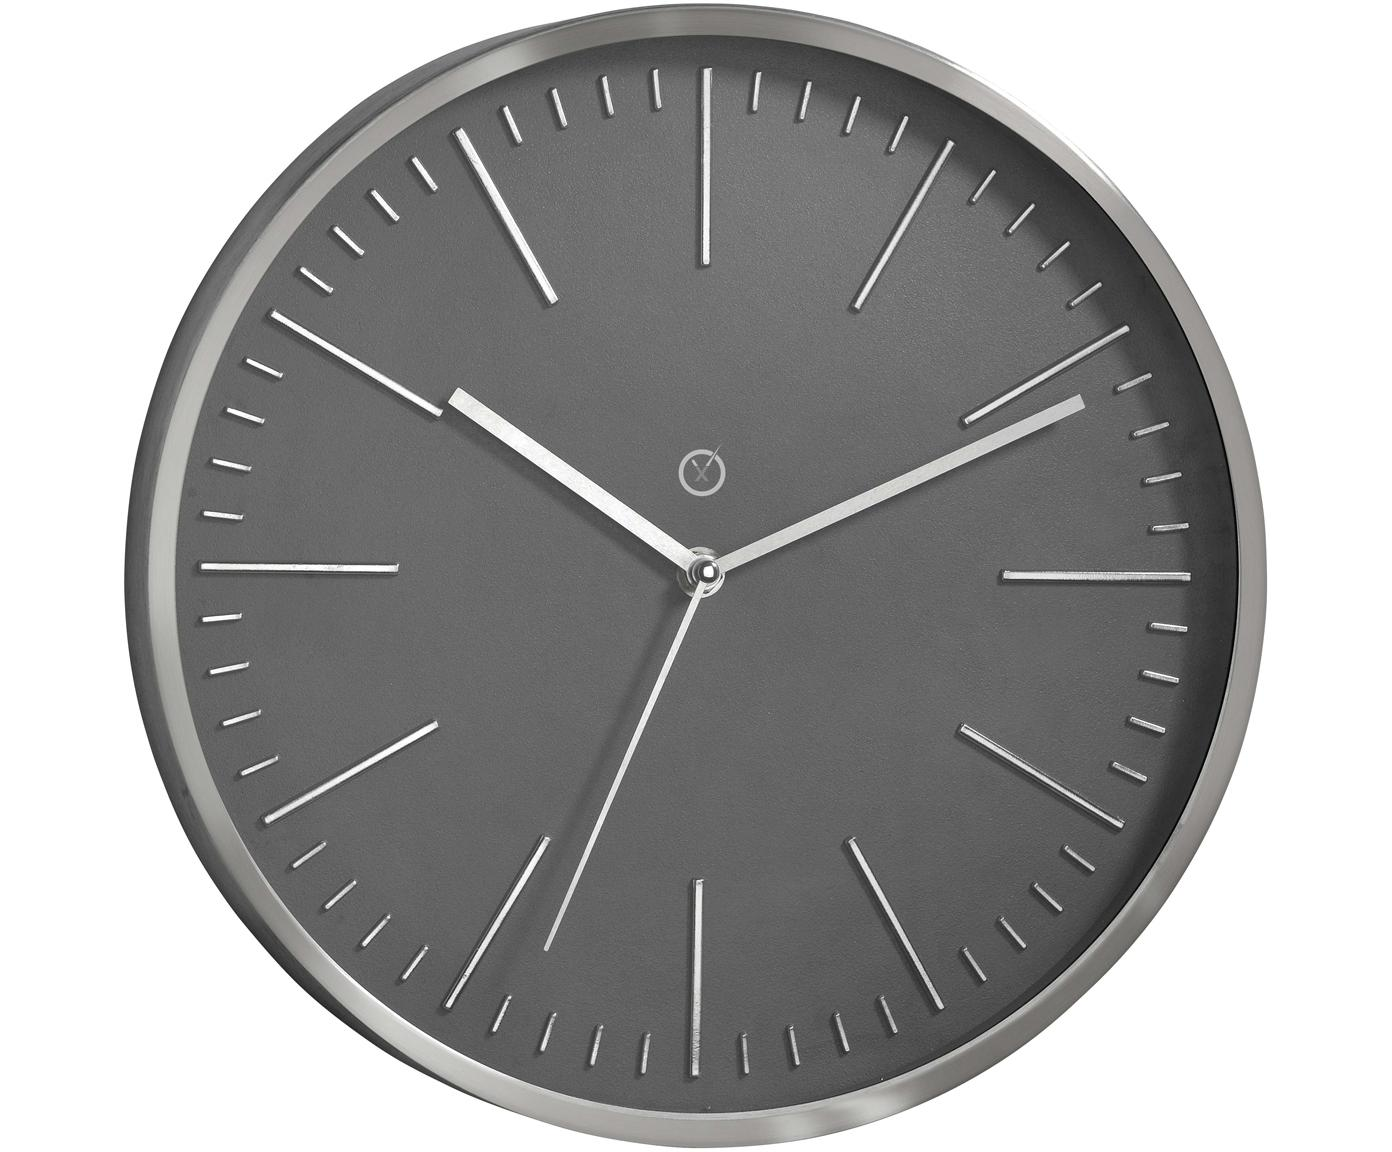 Wanduhr Dakota, Rahmen: Aluminium, Grau, Silberfarben, Ø 30 cm